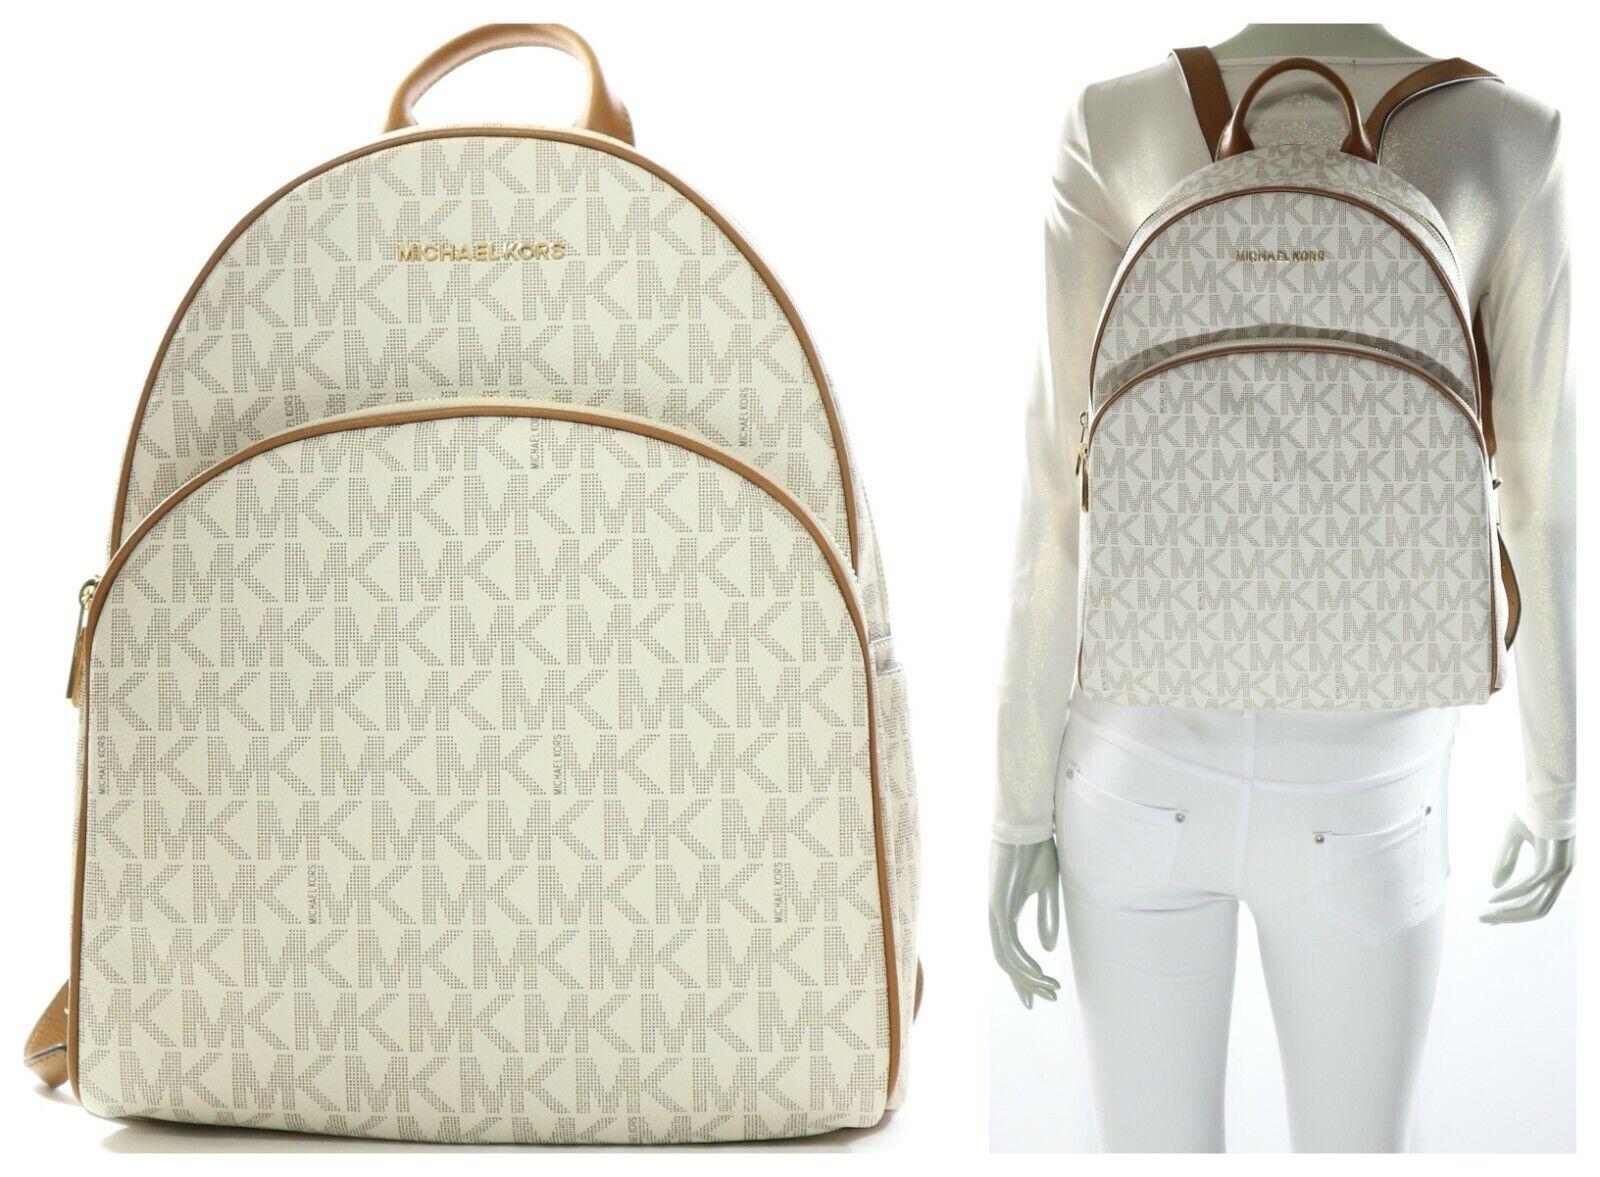 Michael Kors Signature PVC Abbey Large Backpack in Vanillaacorn 35s7gayb3b